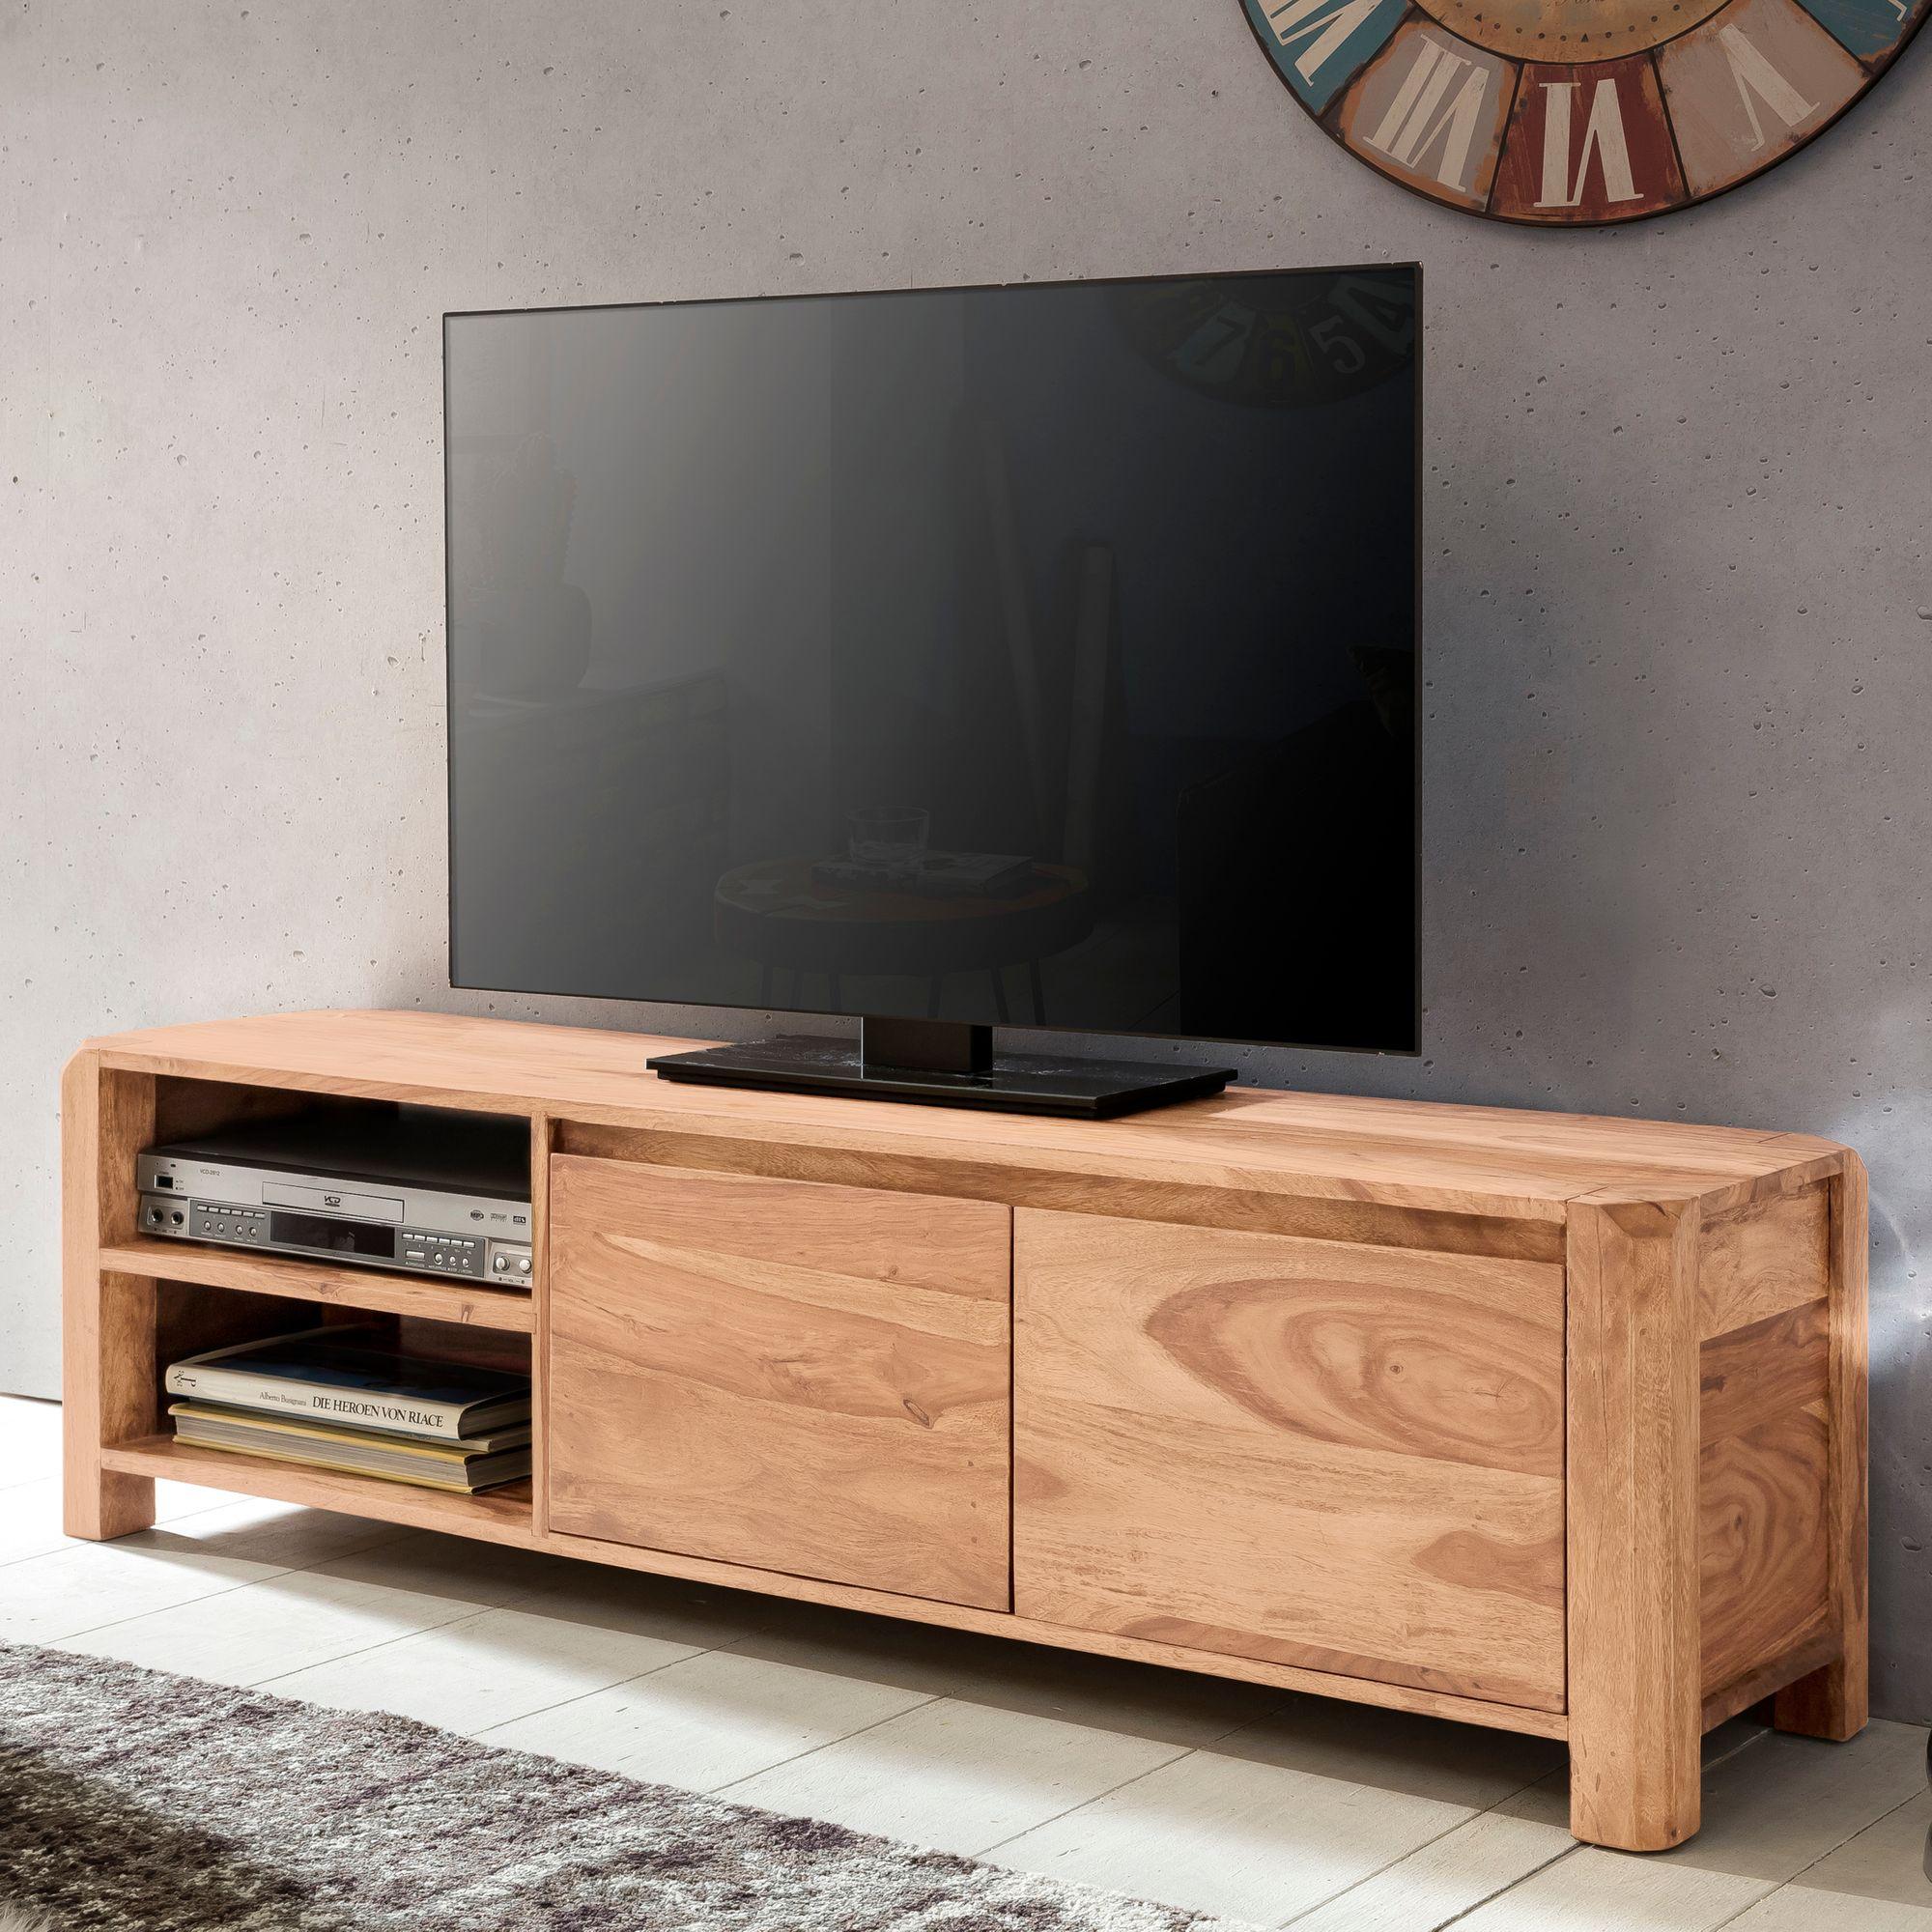 Wohnling Lowboard Boha Massivholz Akazie Kommode 140 Cm Tv Board